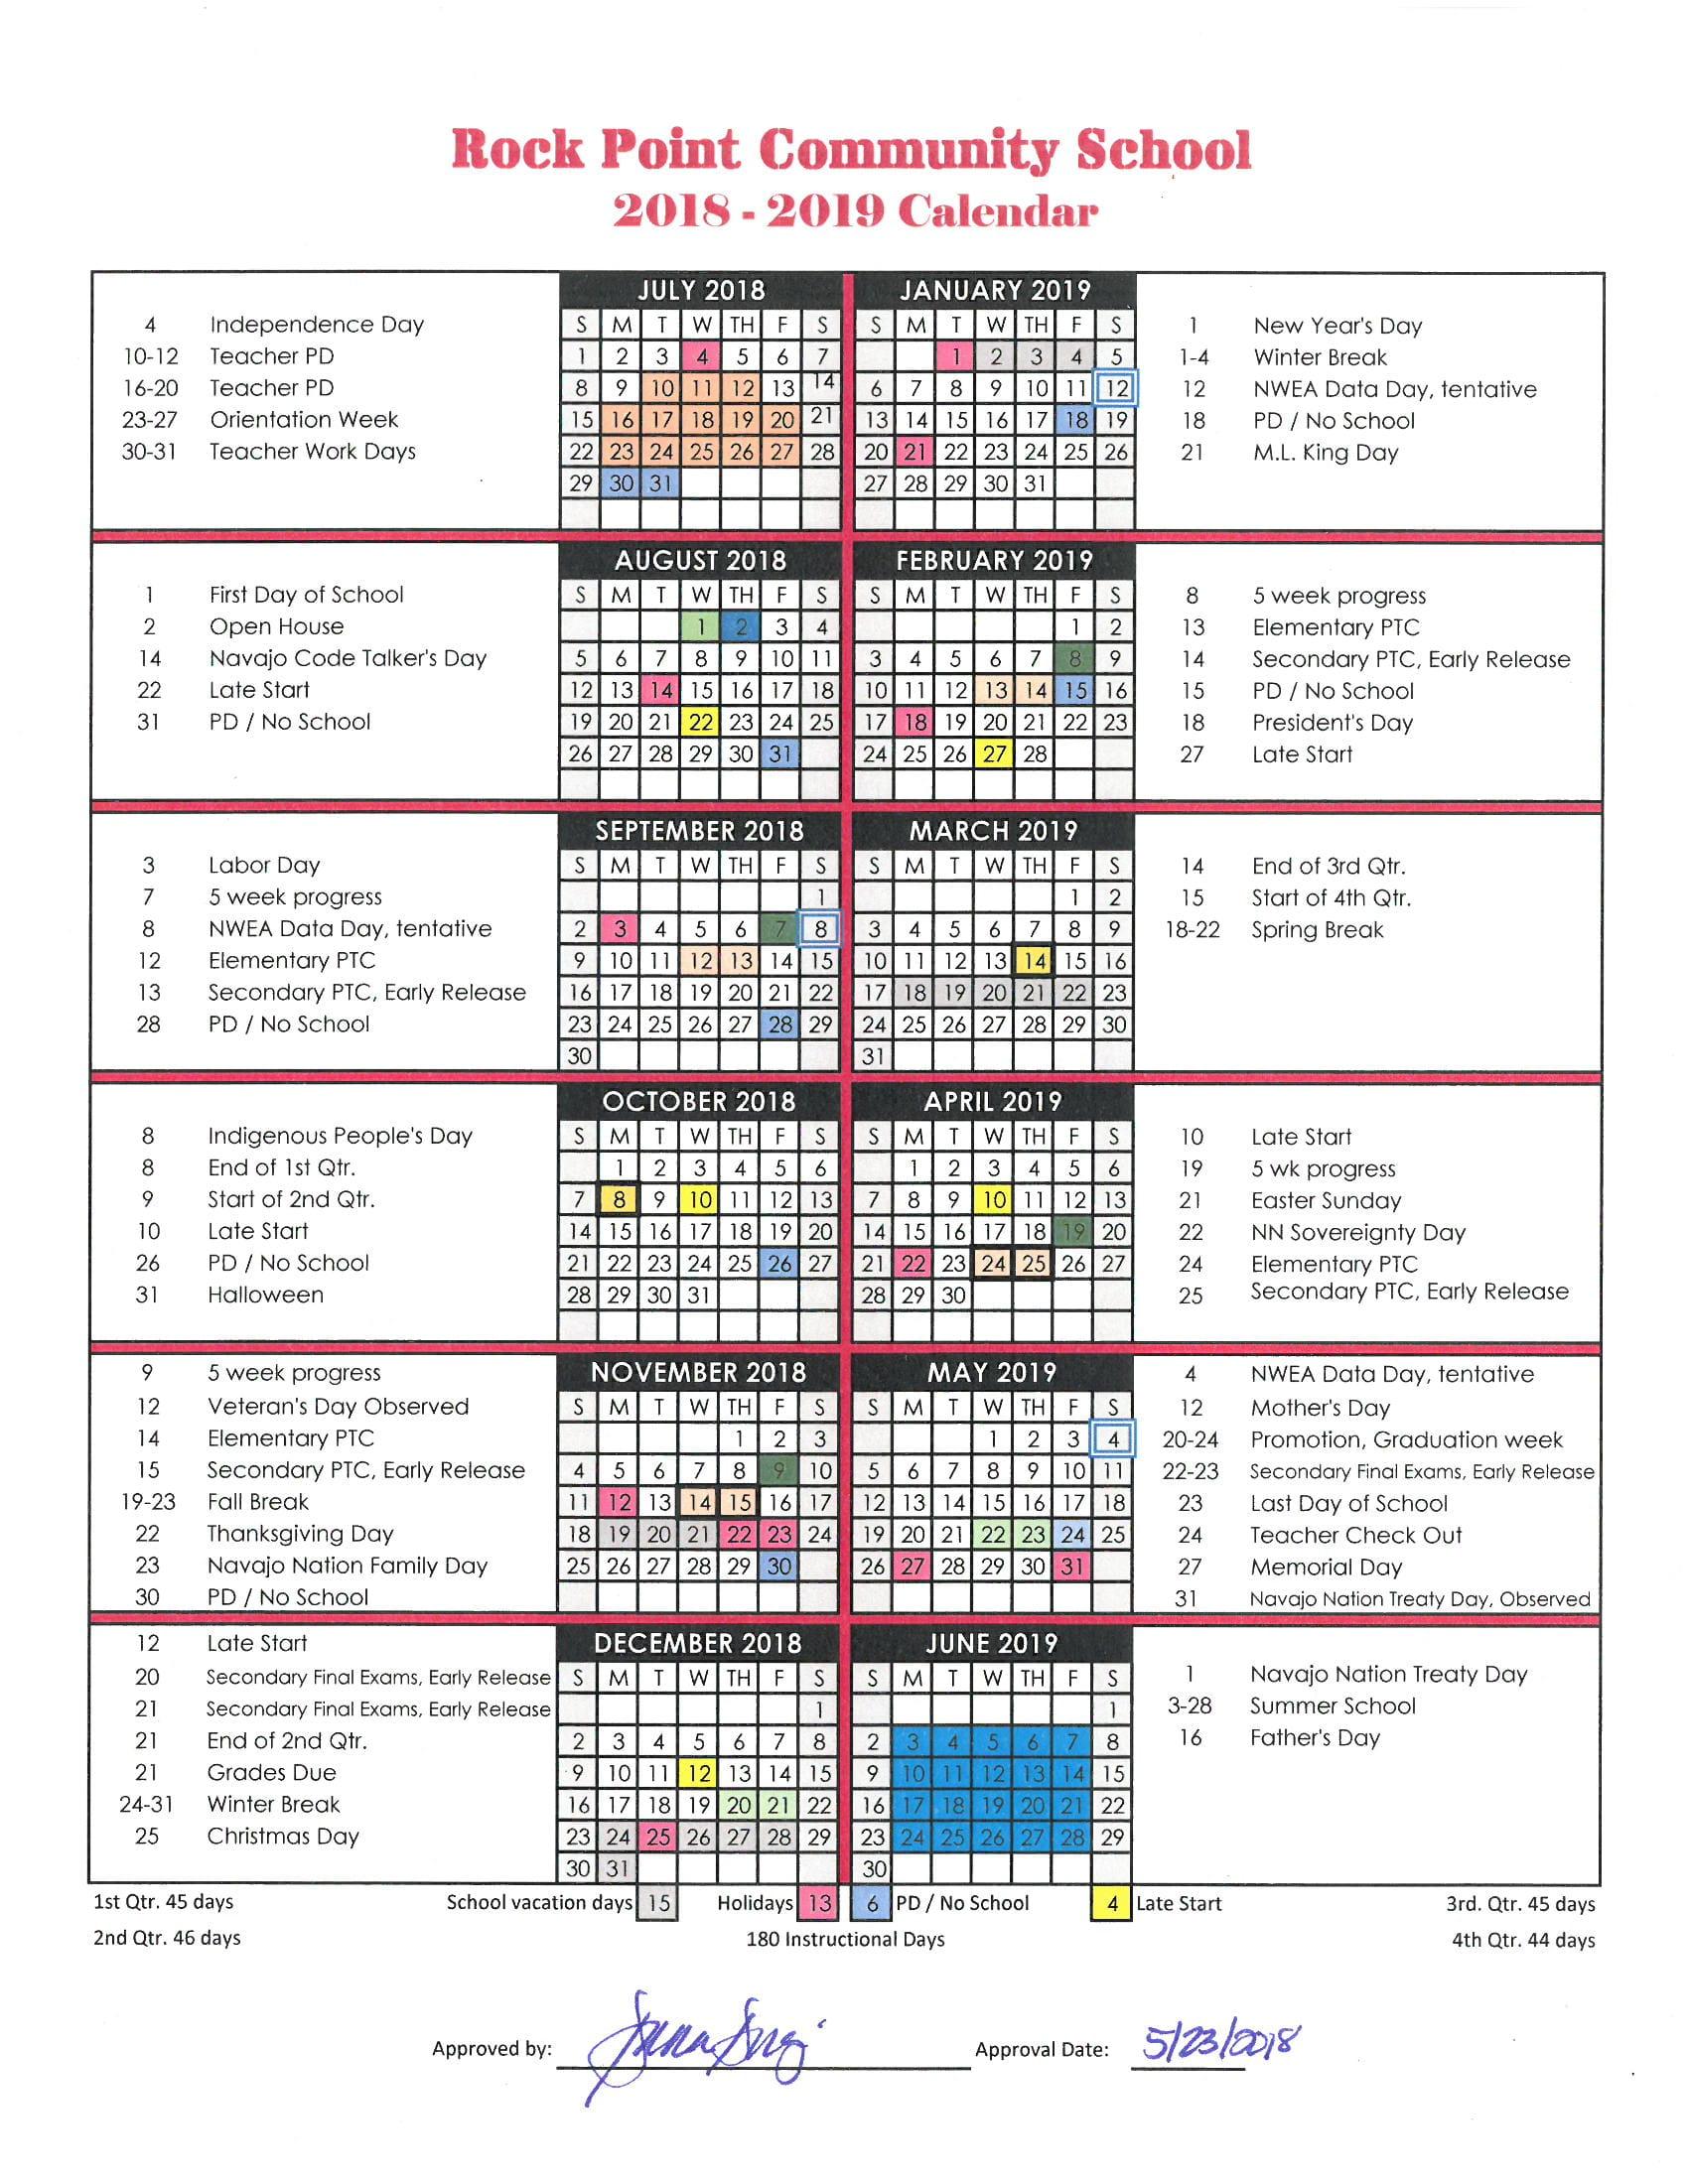 Rock Point Community School School Calendar 2018 2019